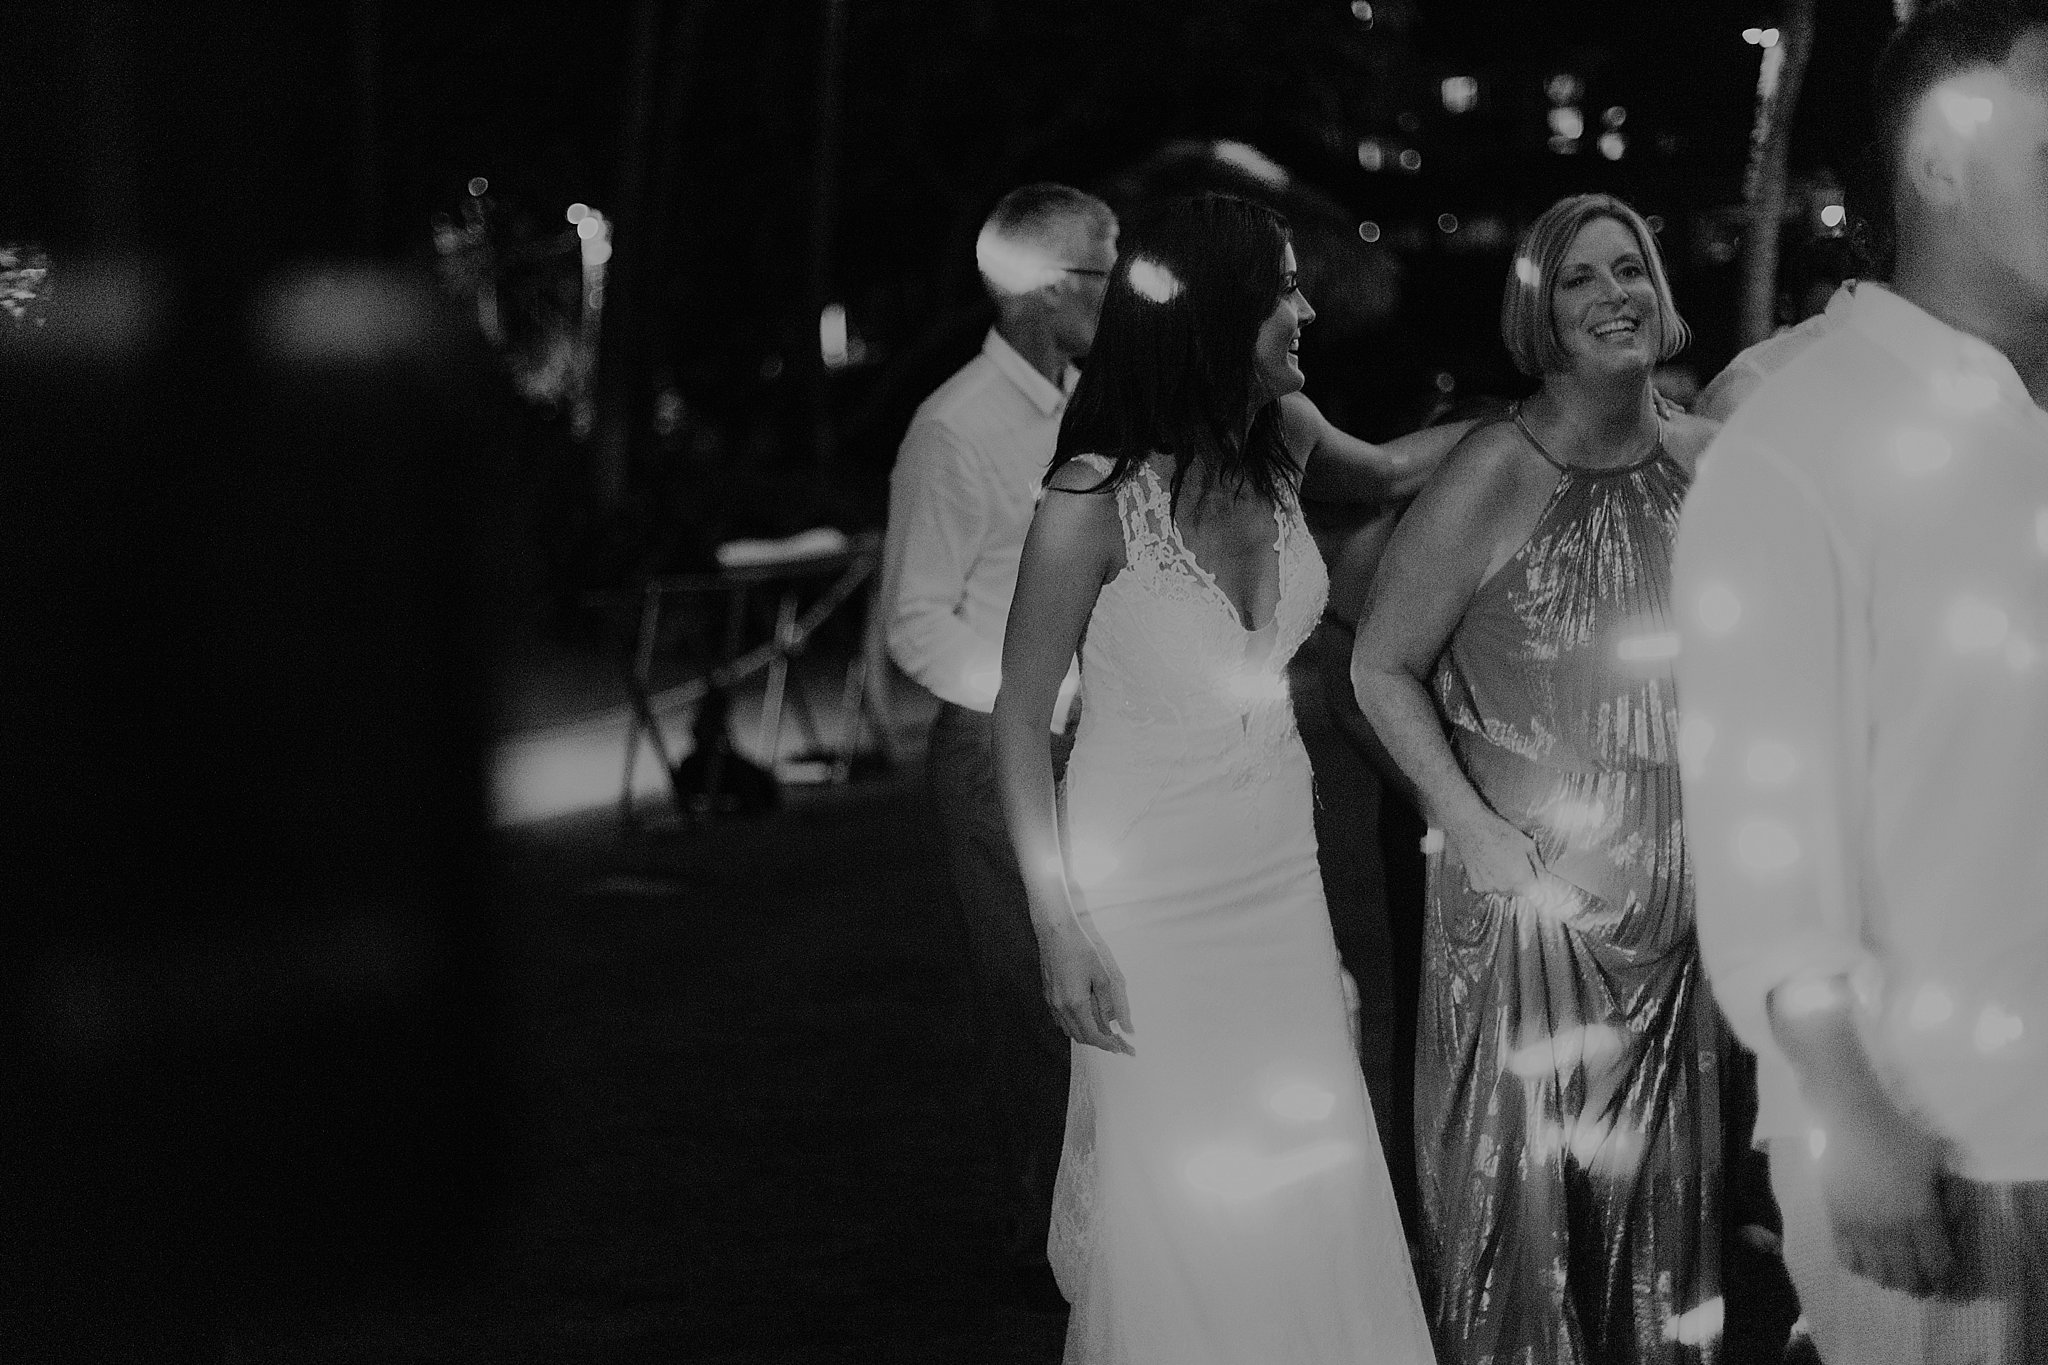 samantha_mcfarlen_bellingham_washington_engagement_photography_seattle_wedding_photographer_0259.jpg